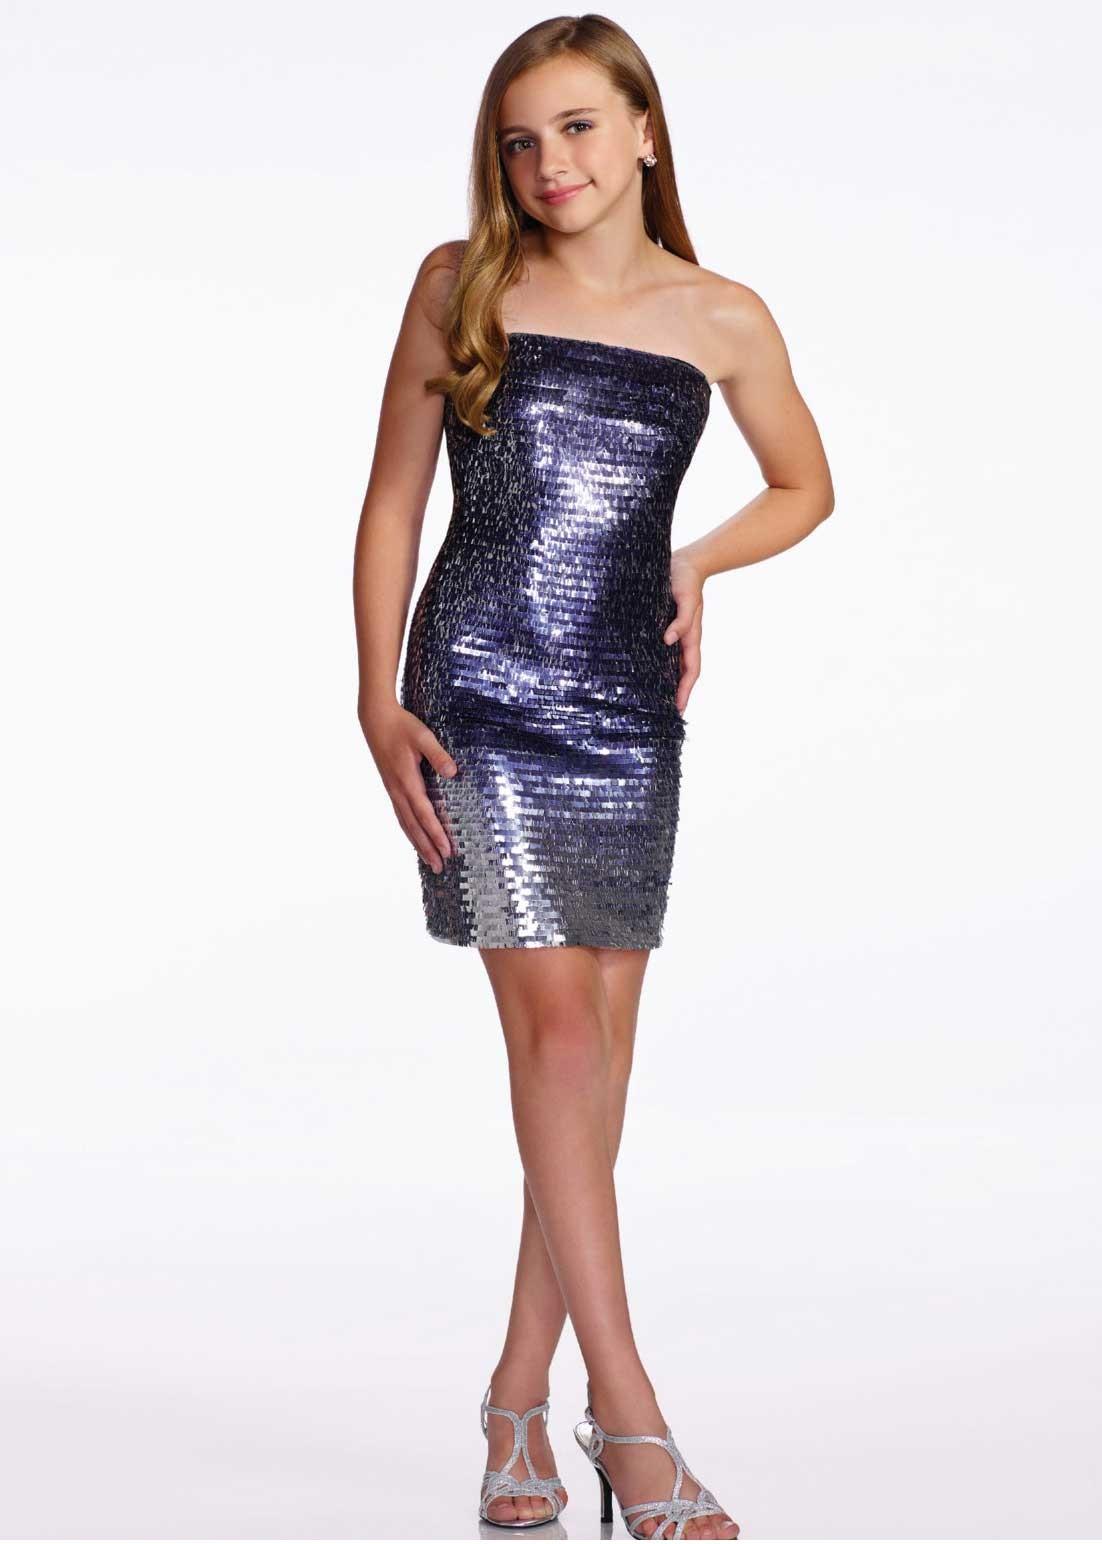 Lexie By Mon Cheri Tw11658 Girls Ombre Sequin Short Dress